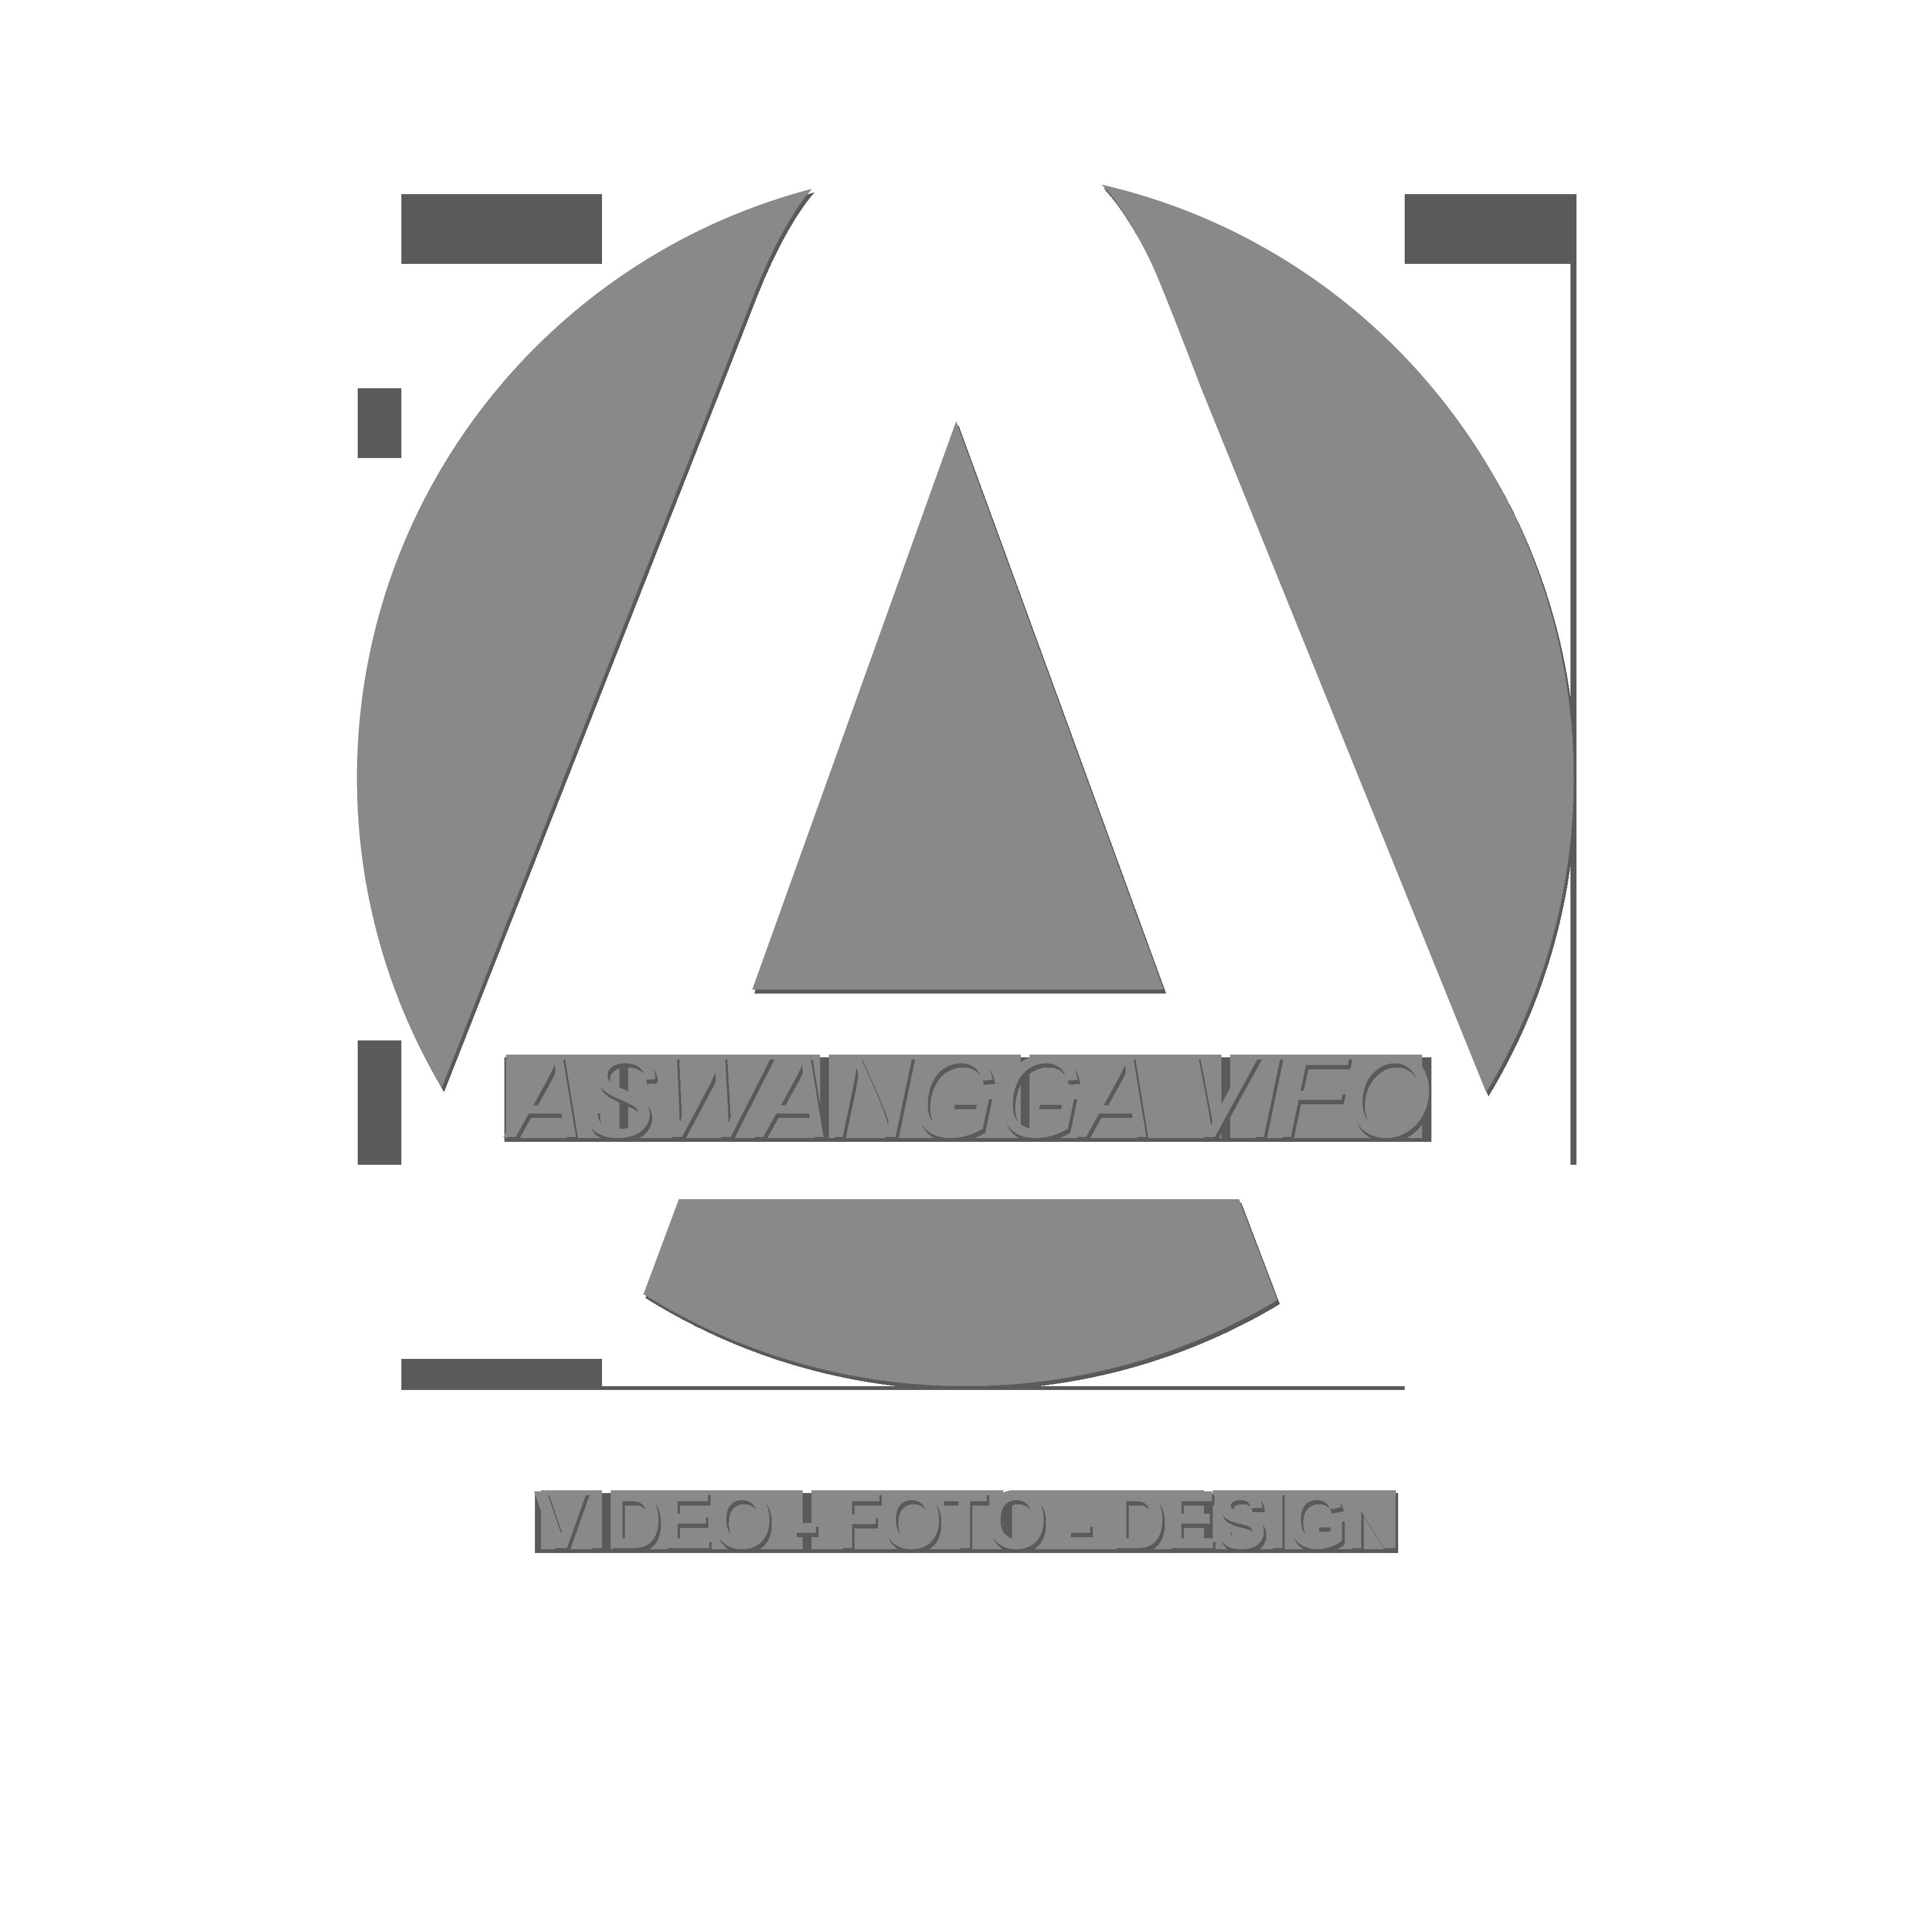 Aswangga logo